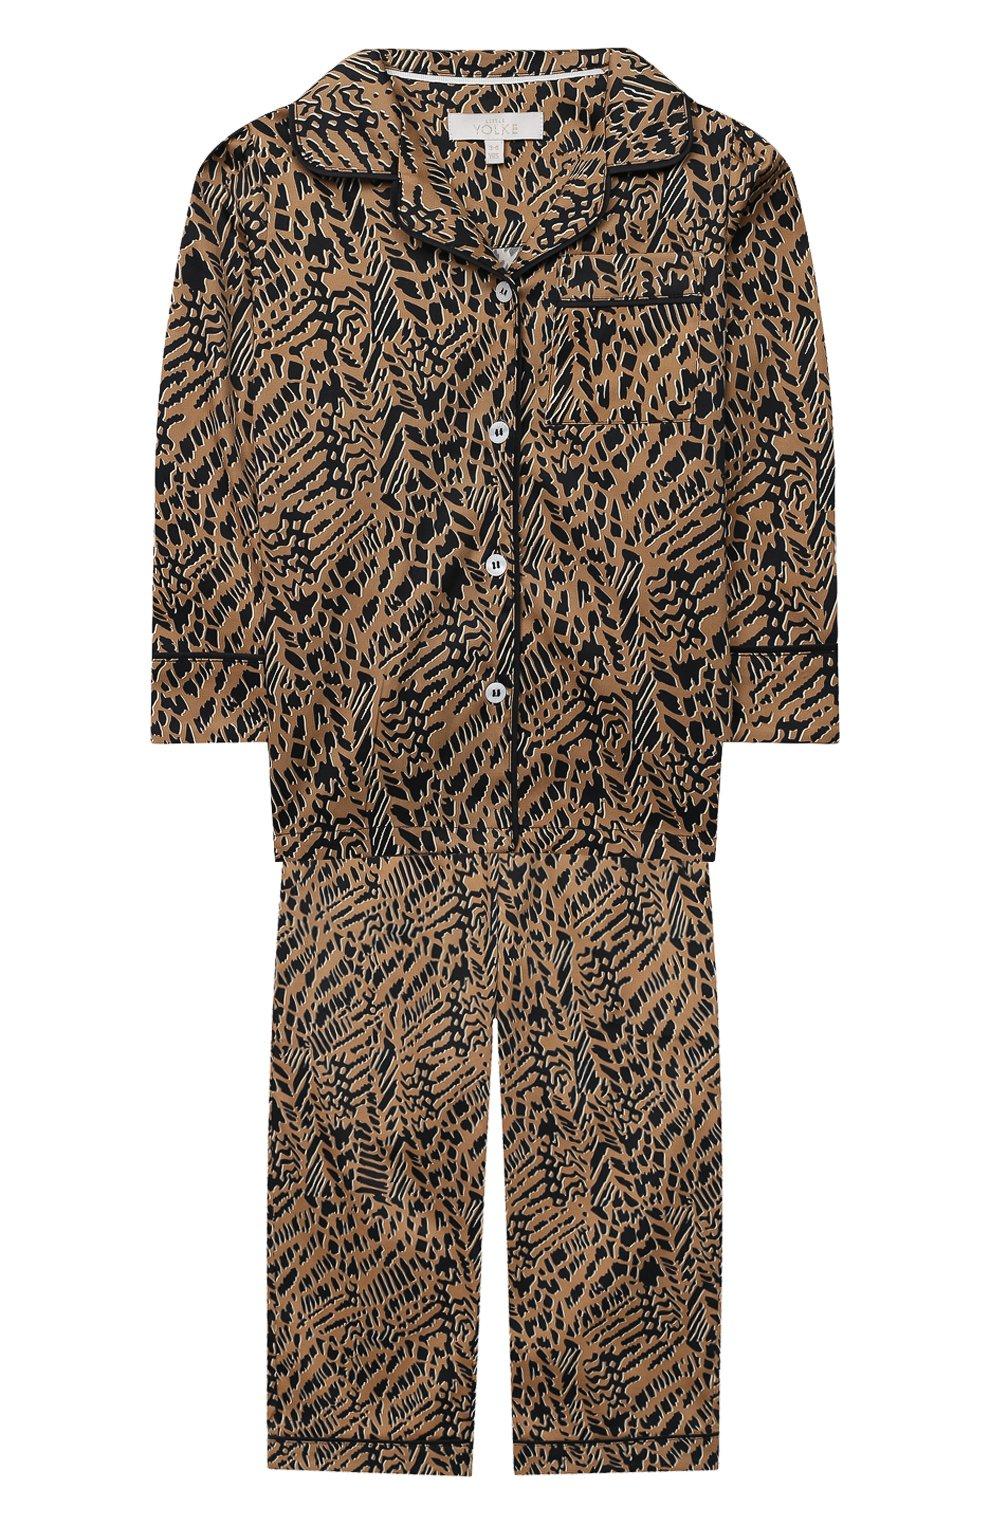 Детская хлопковая пижама LITTLE YOLKE леопардового цвета, арт. SS21-12C-AN-DI/1-8Y | Фото 1